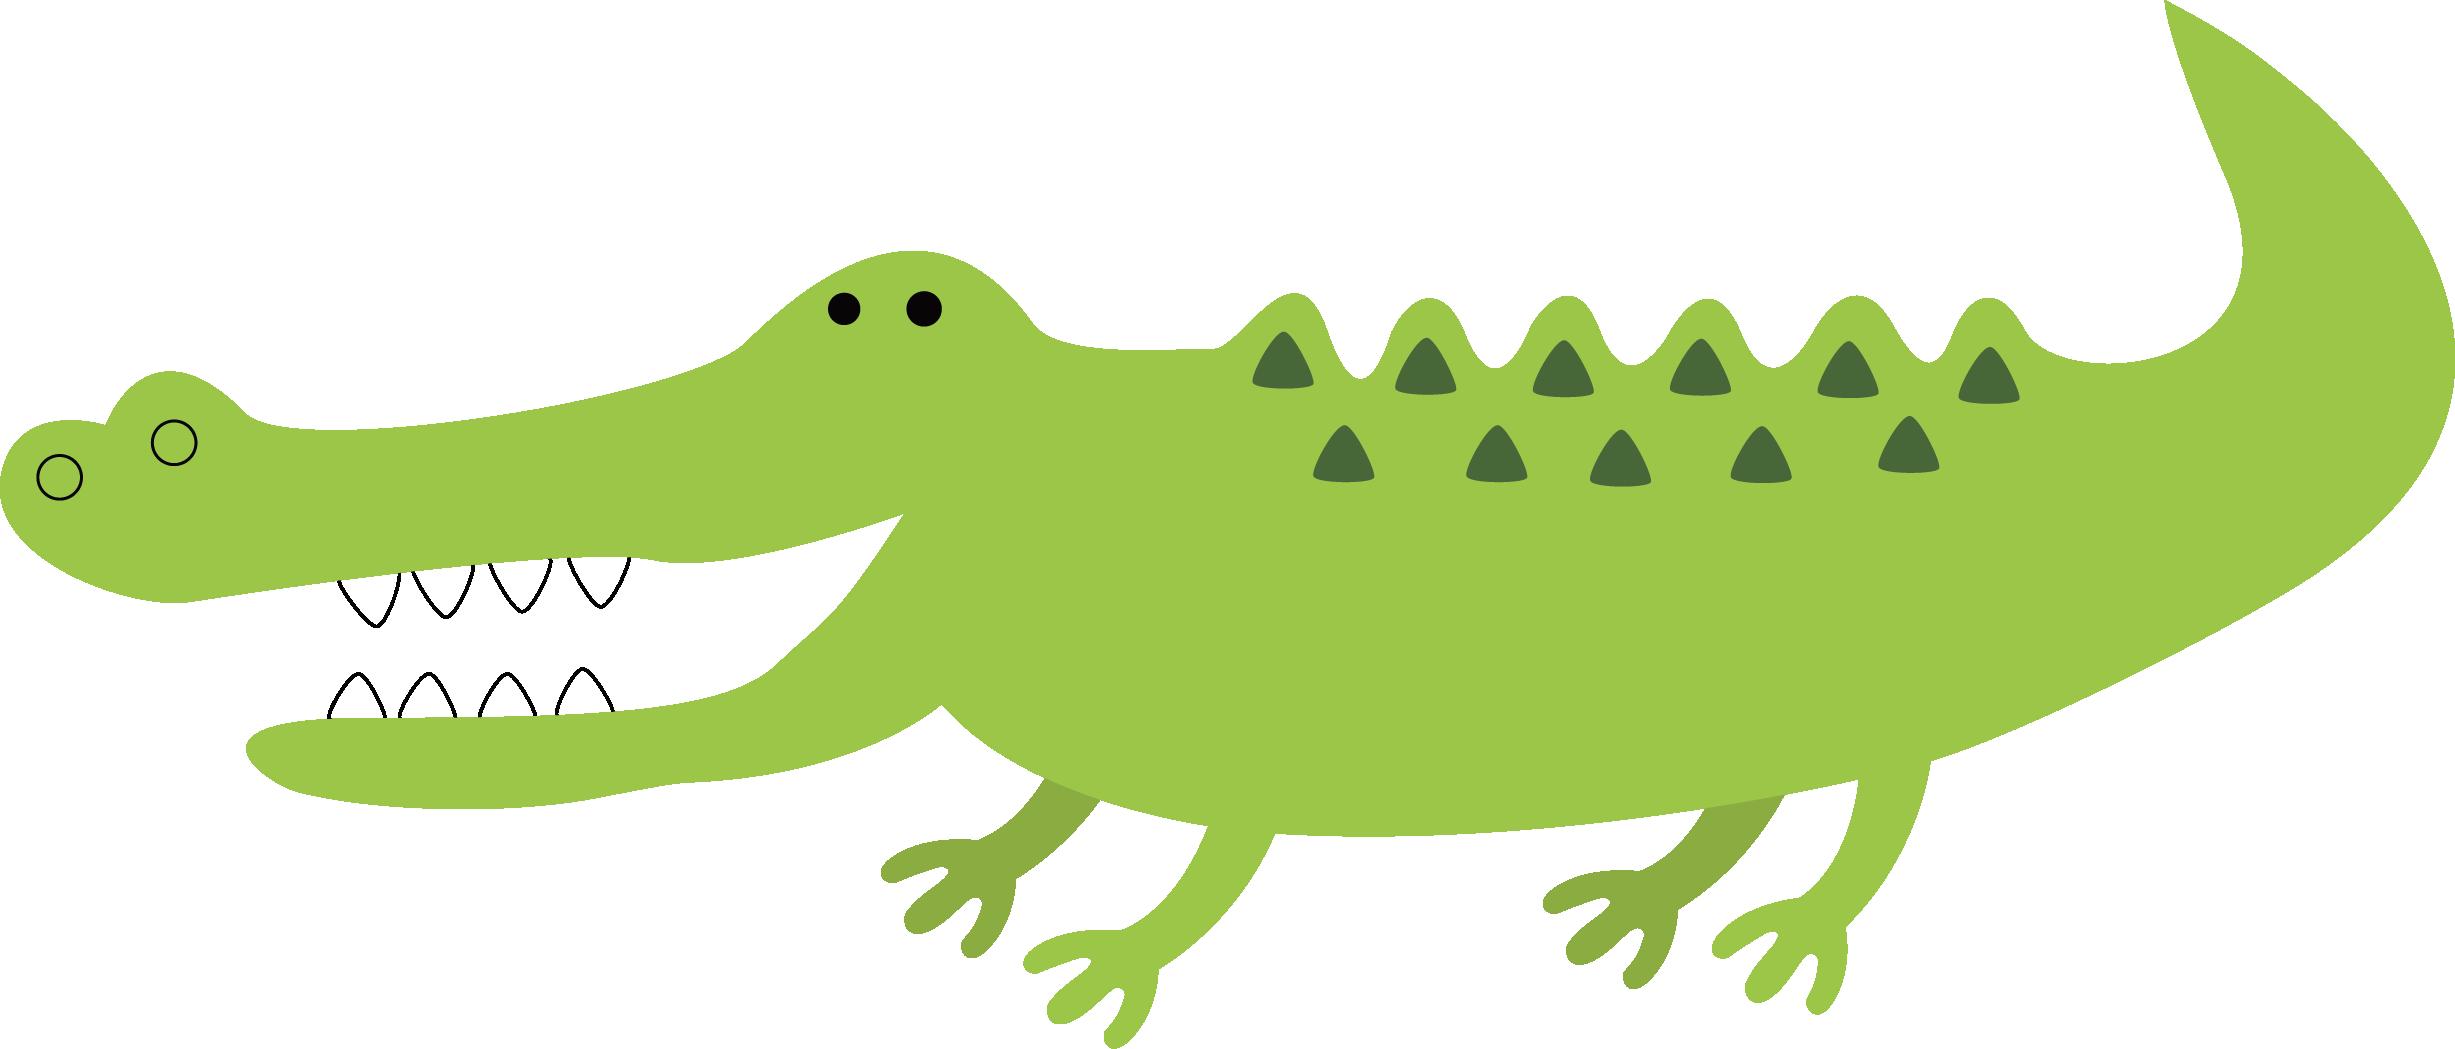 Pear clipart crocodile. Alligator green jaw vector